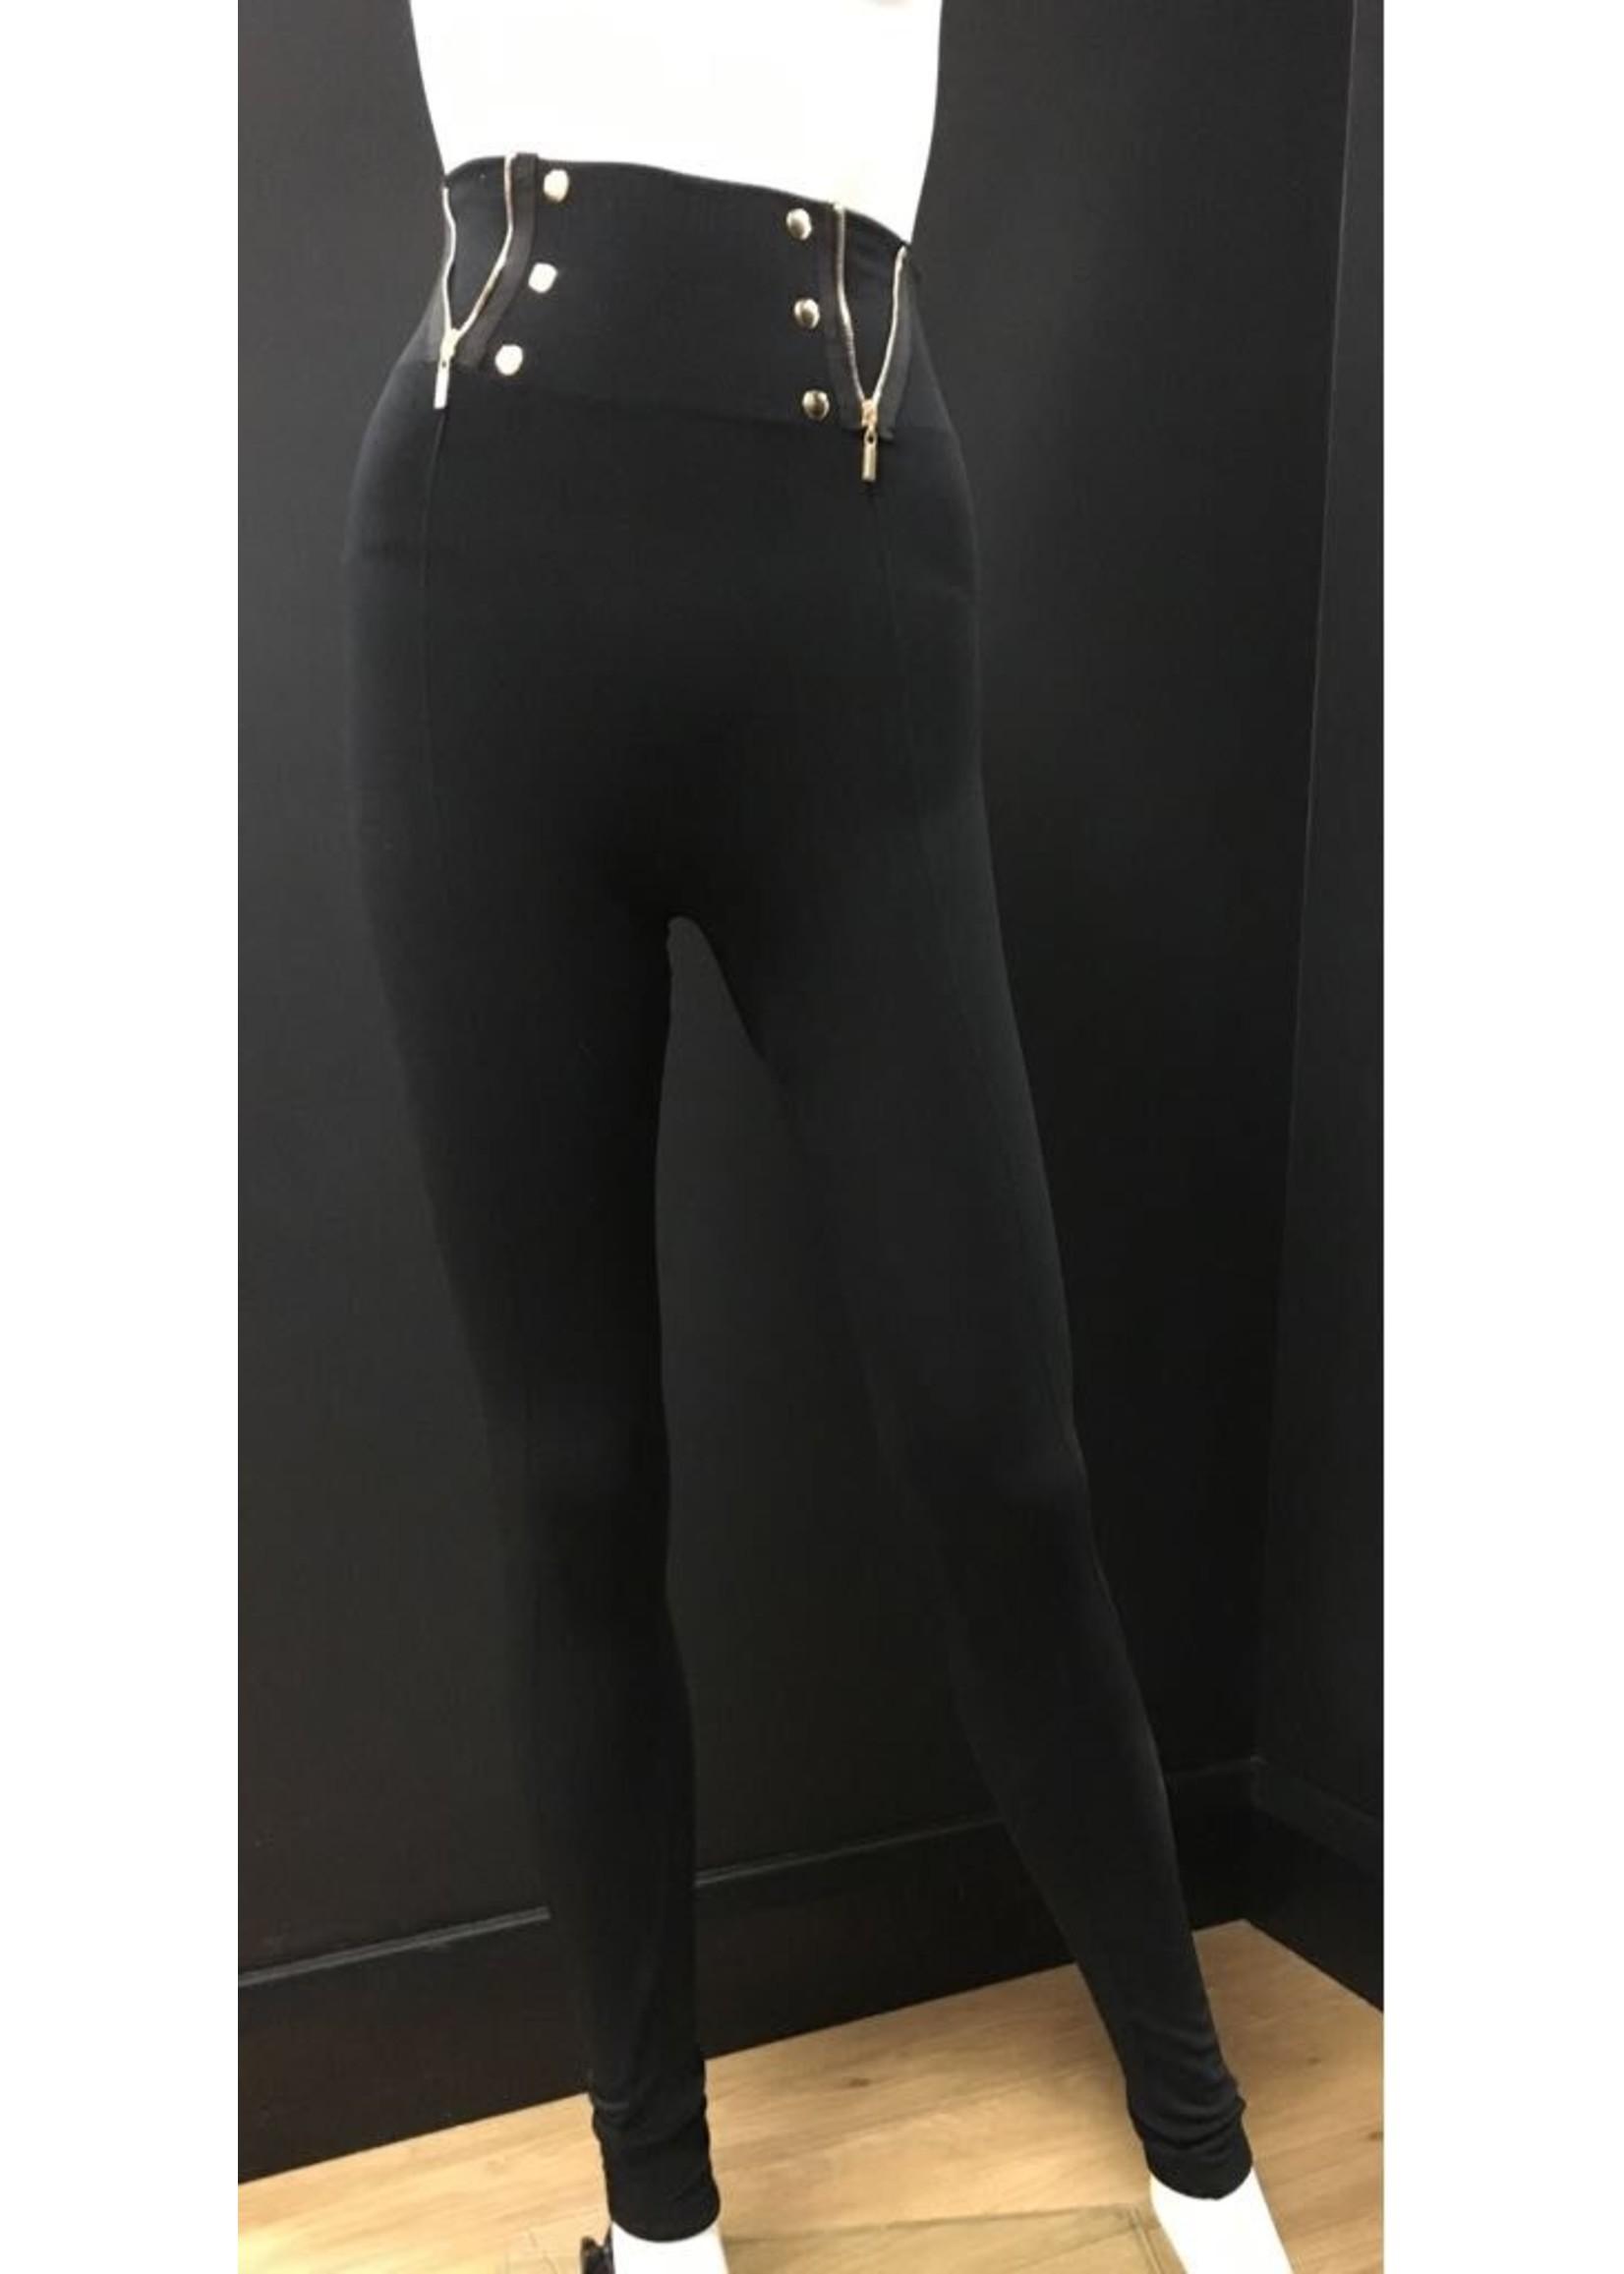 Zip & Button Everyday Leggings